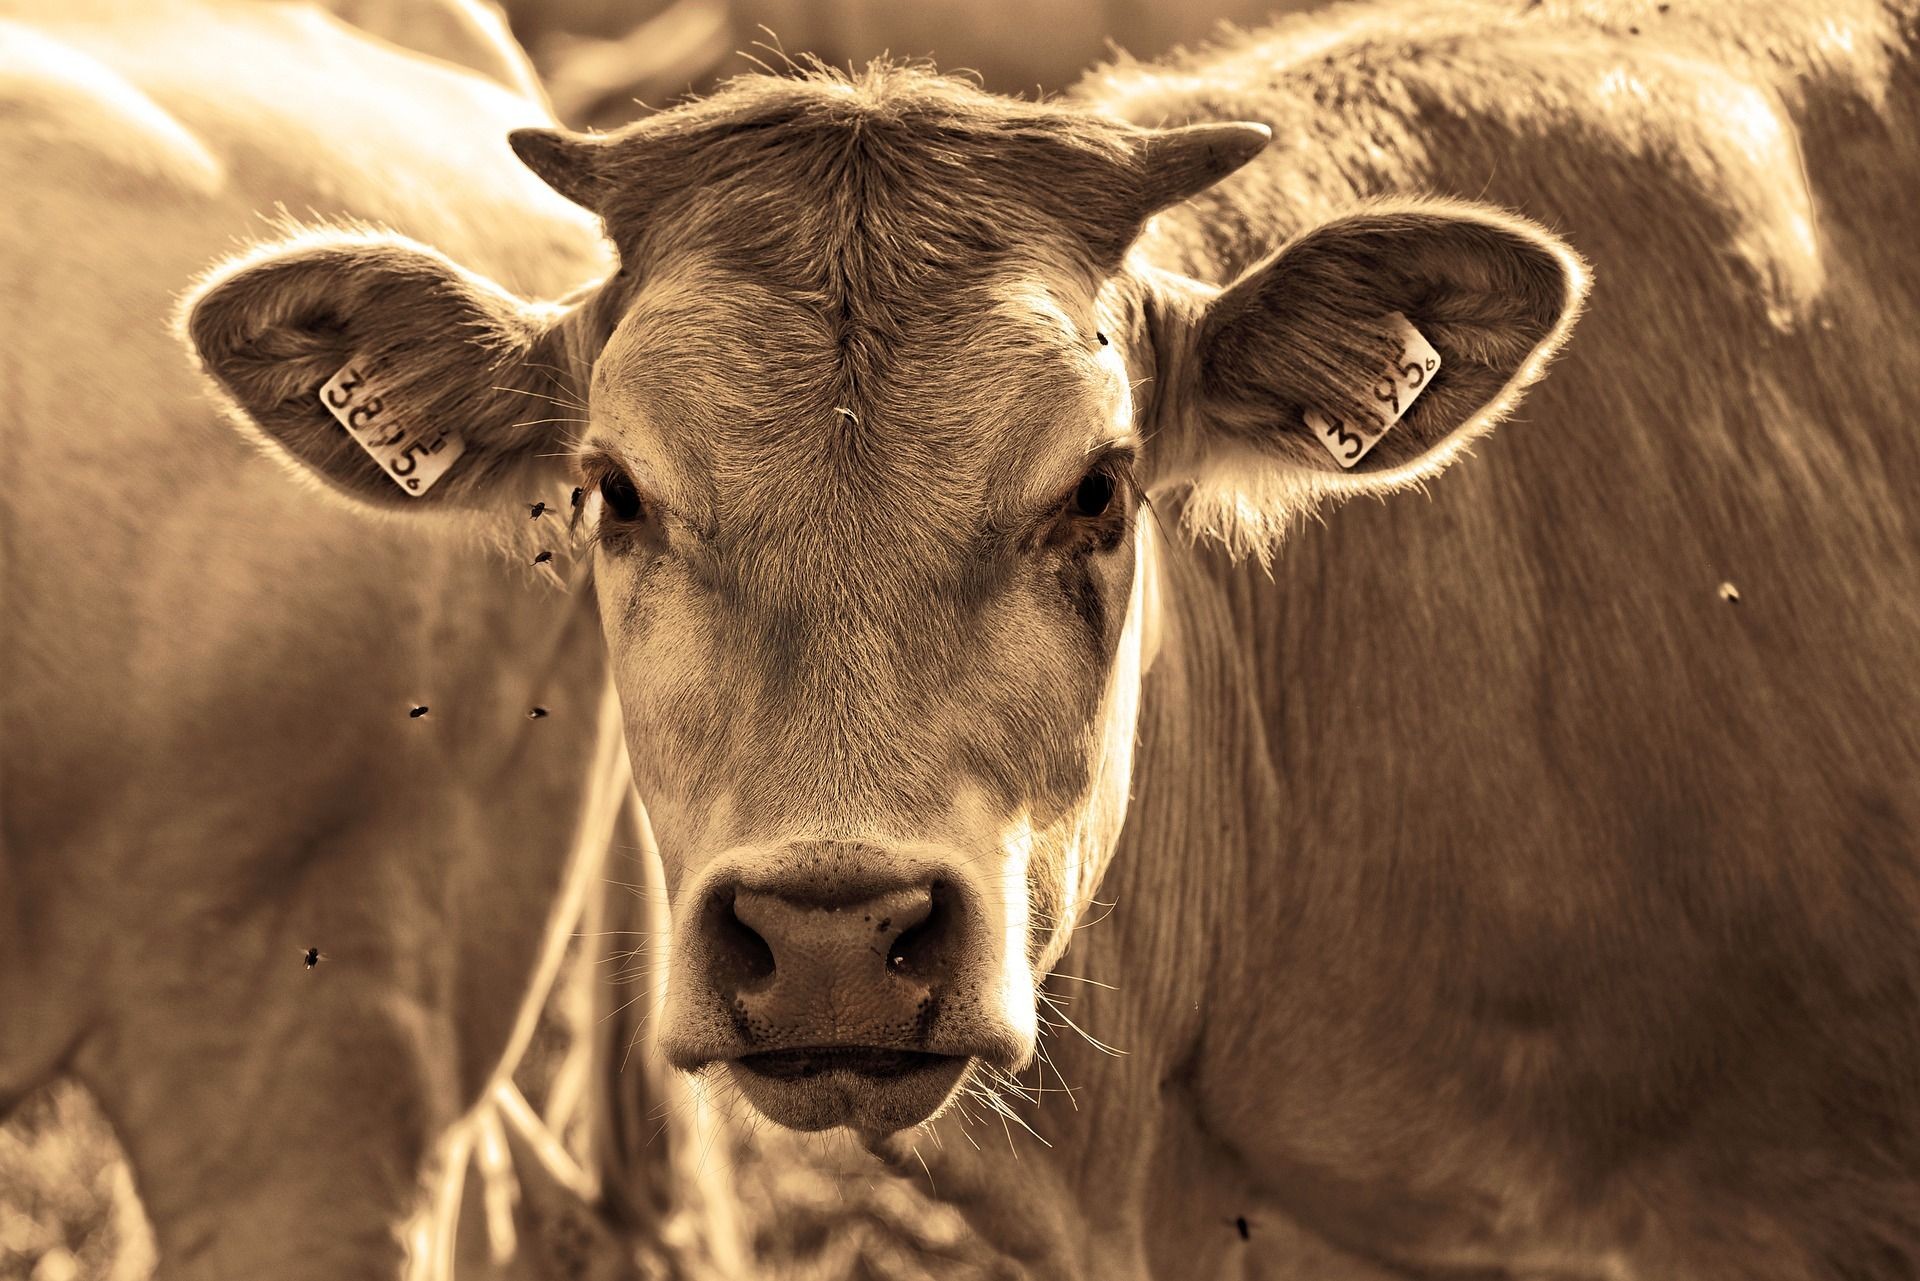 cow-3454611_1920